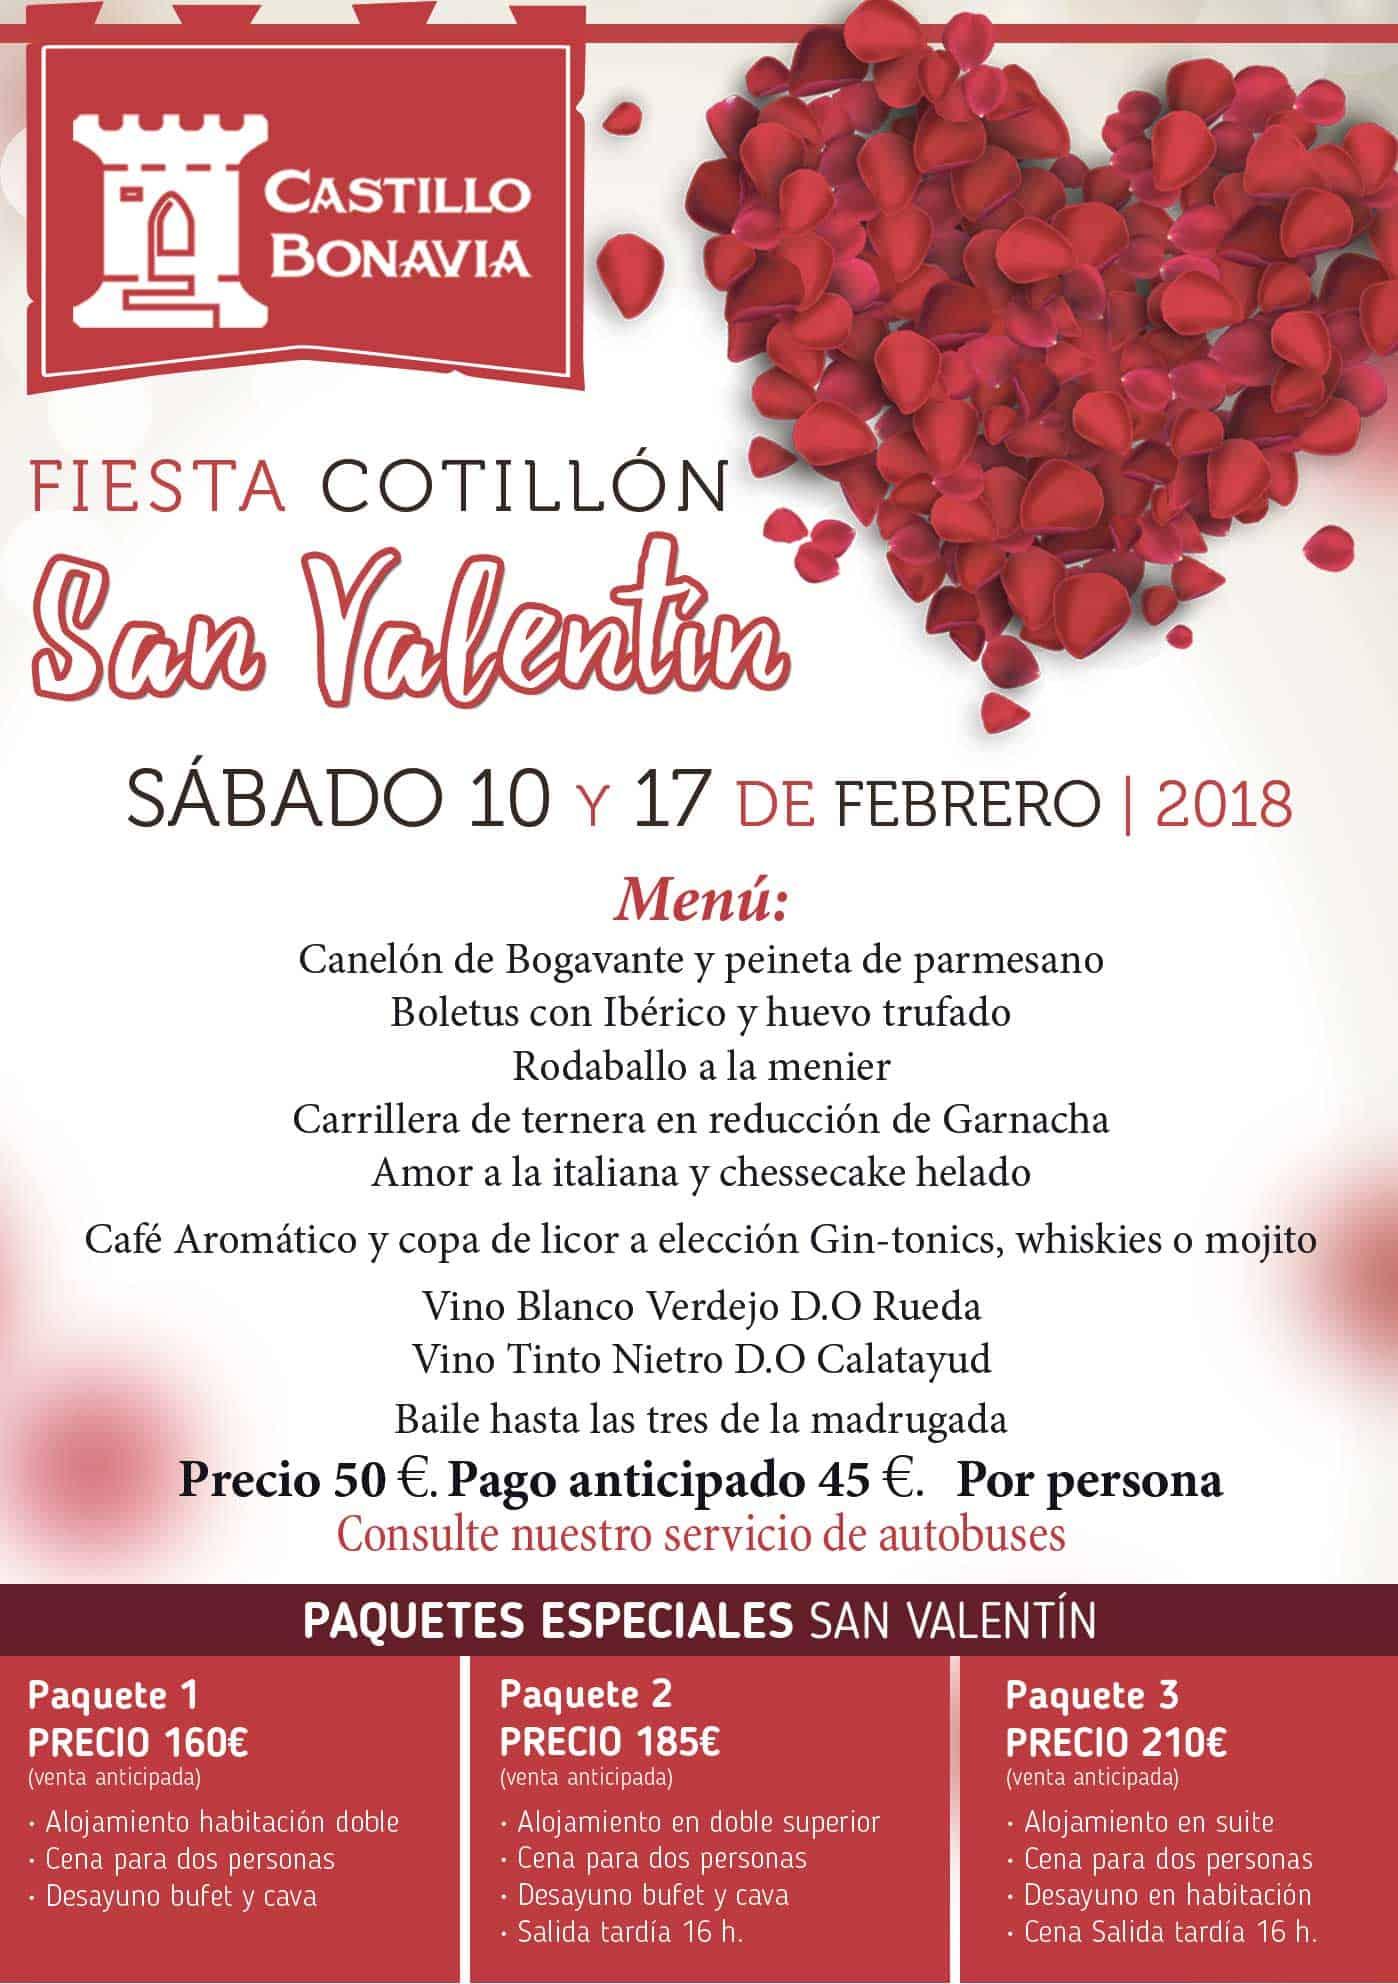 Castillo_bonavia_SanValentin-2018